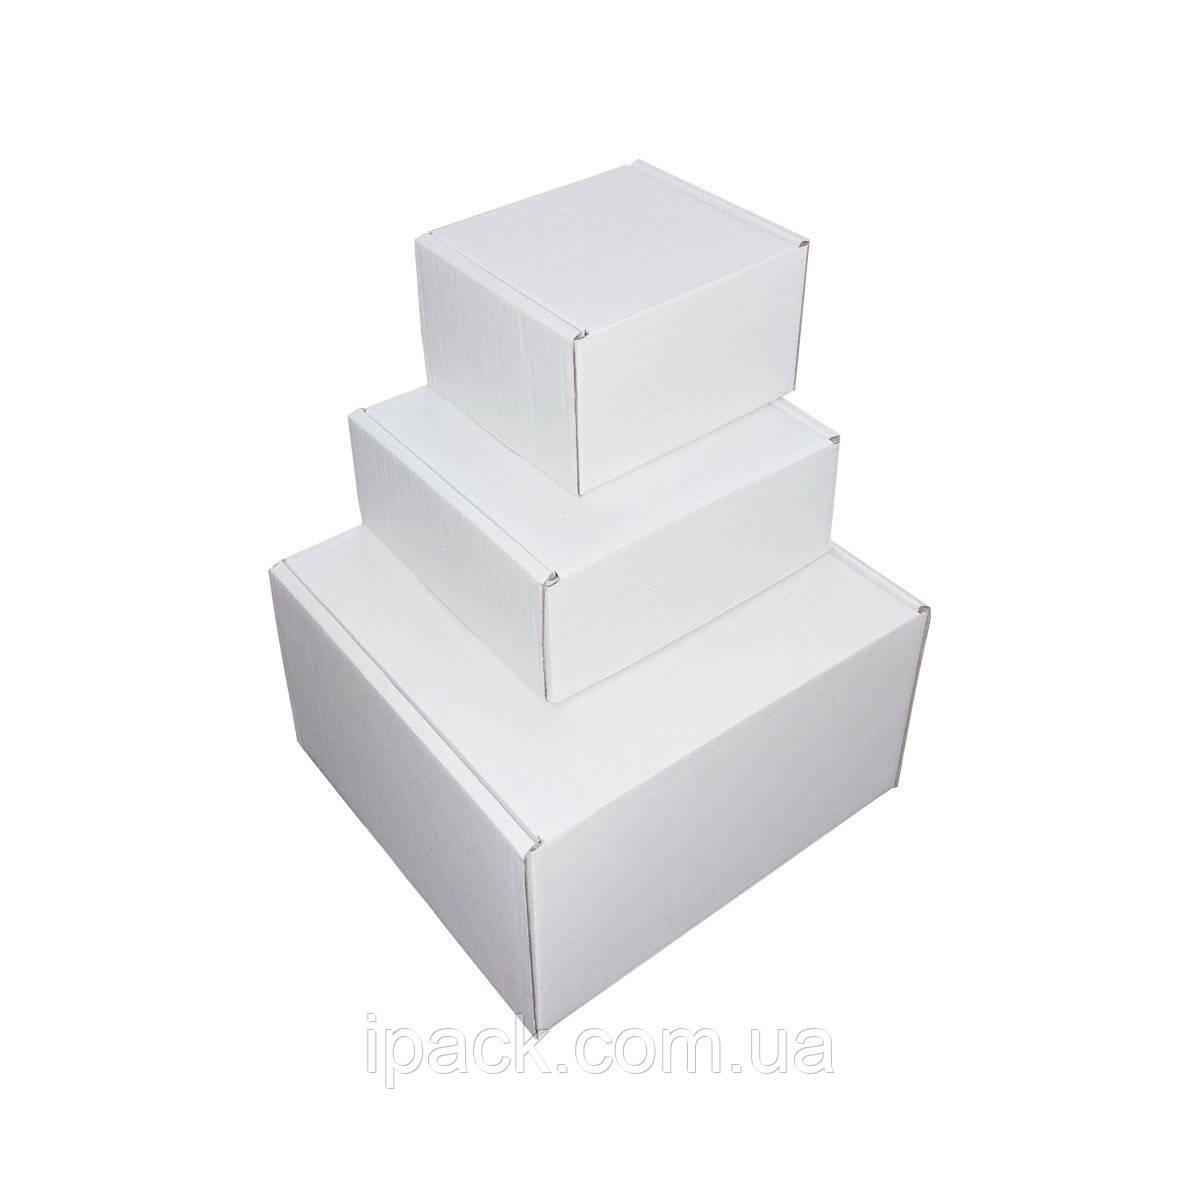 Коробка картонная самосборная, 143*102*100, мм, белая, микрогофрокартон